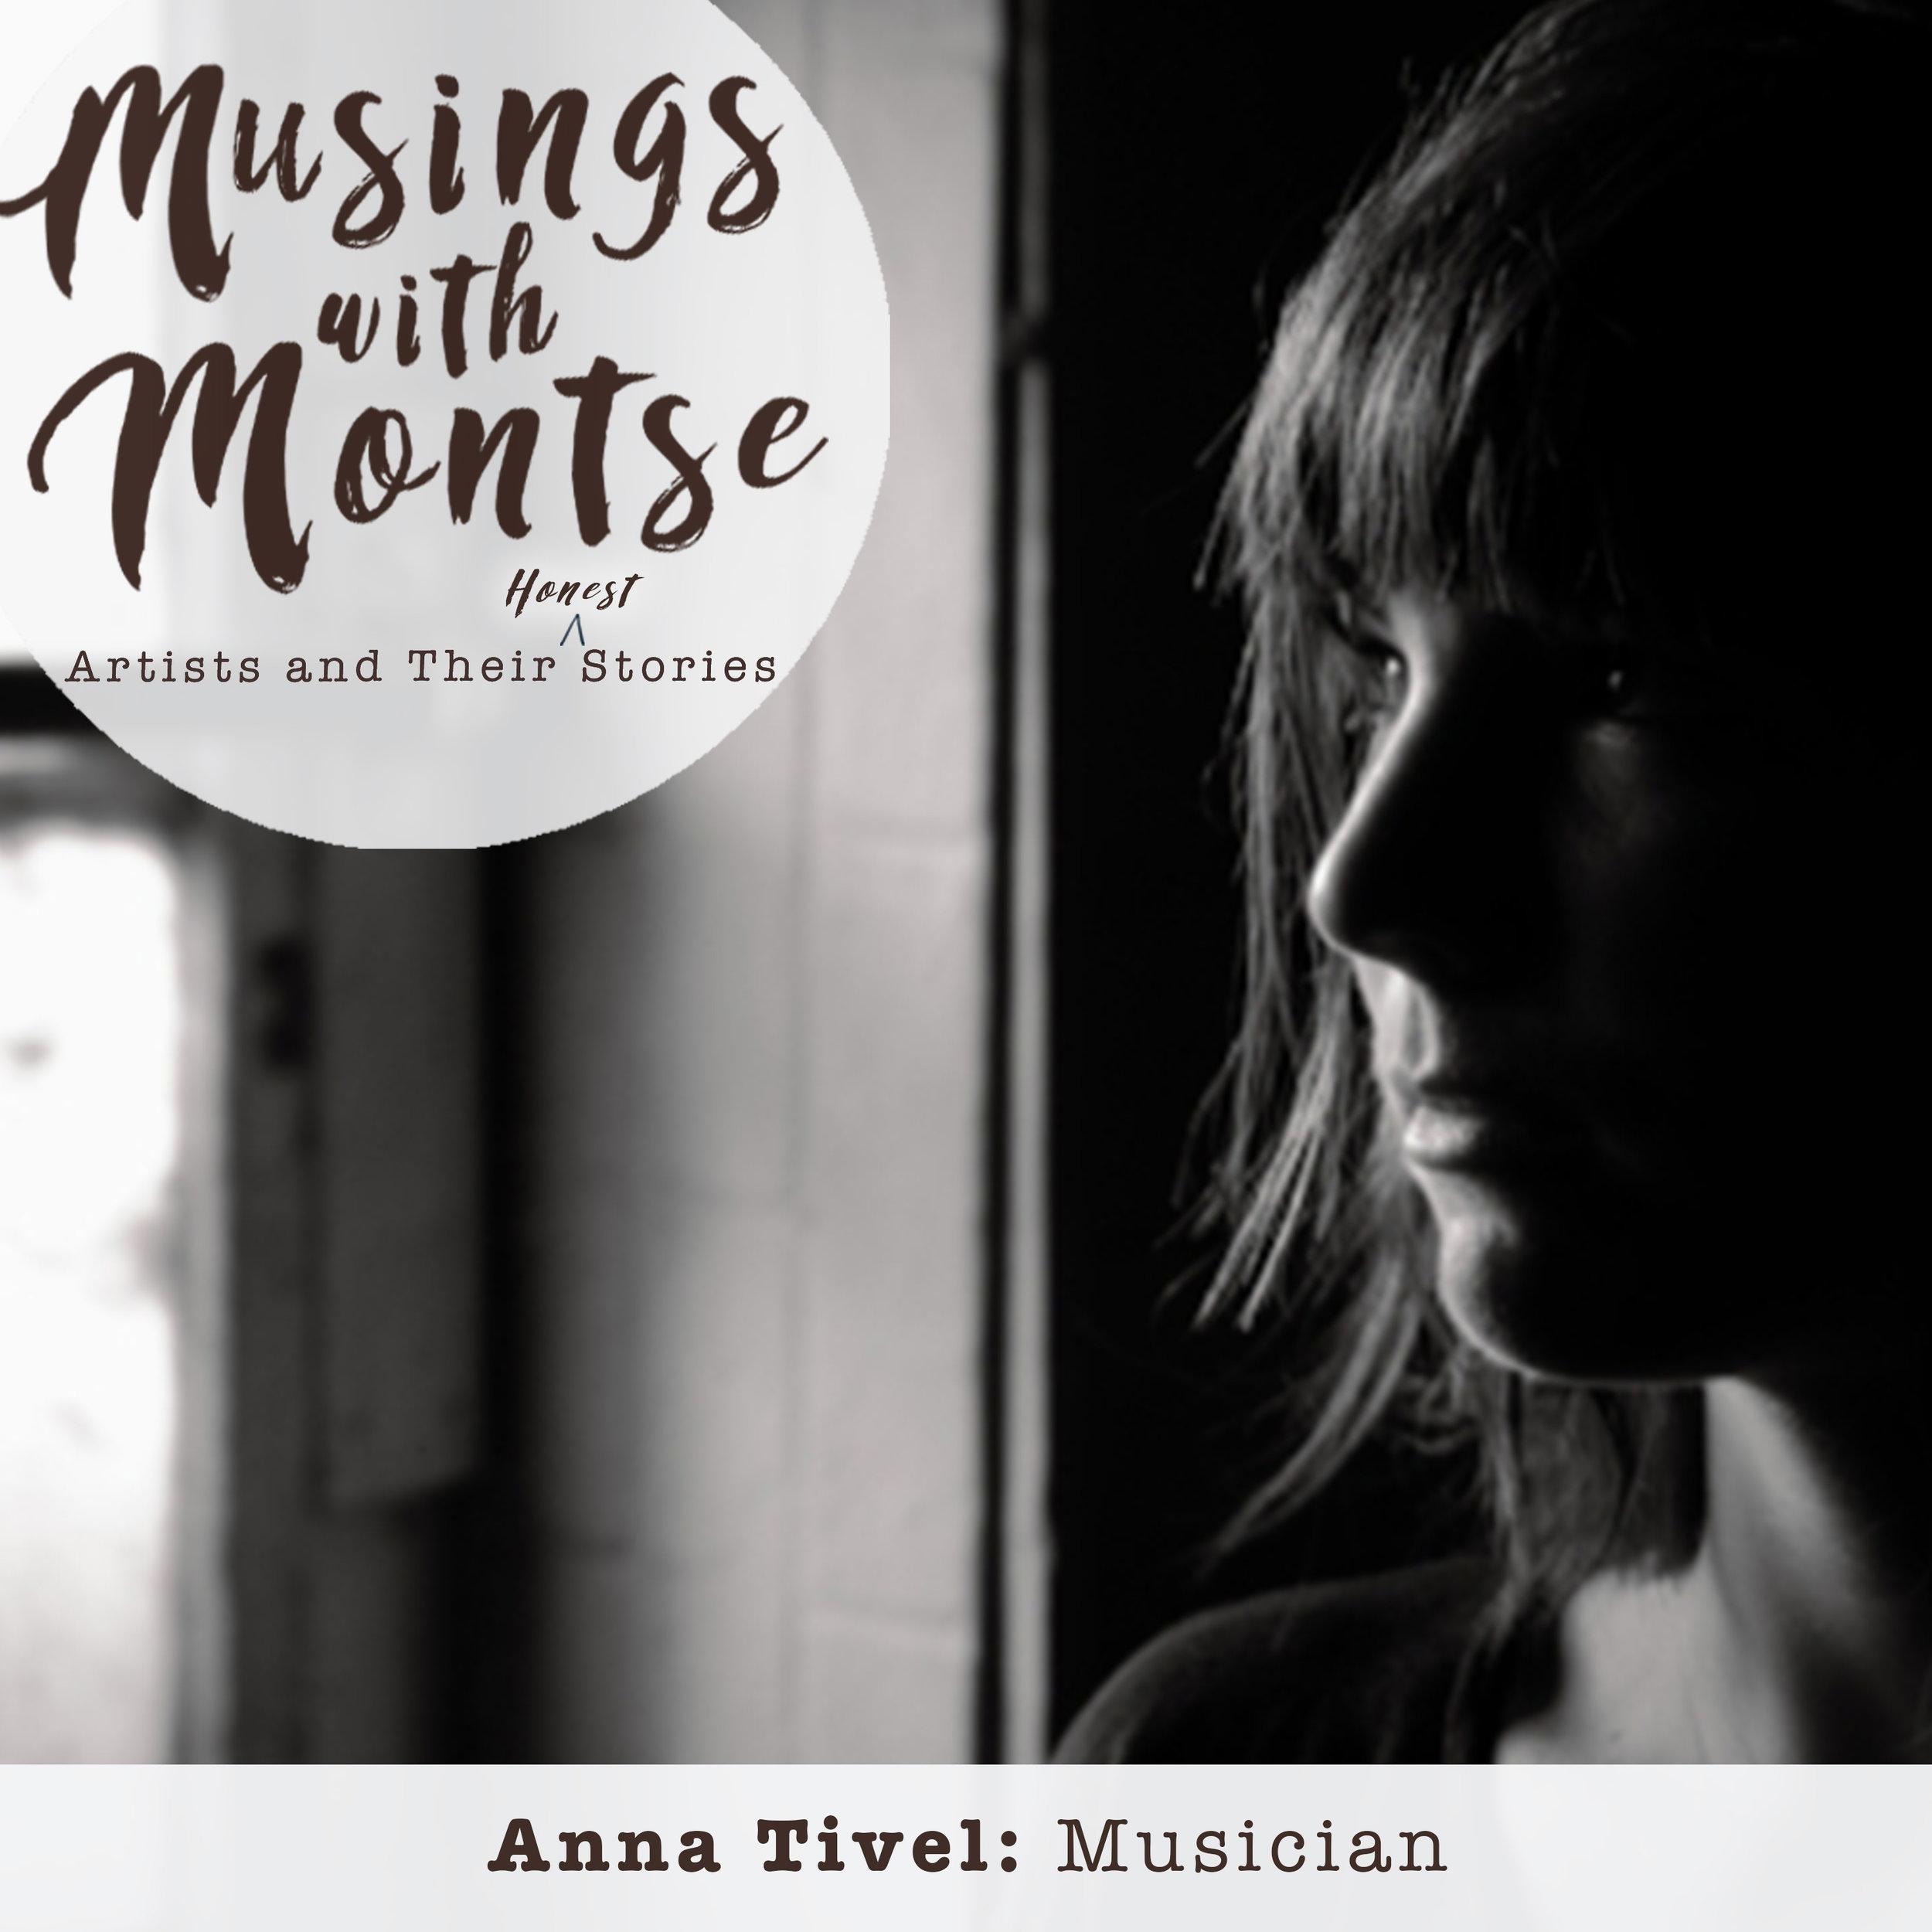 Where to find Anna:    Instagram    Facebook    Spotify    Website